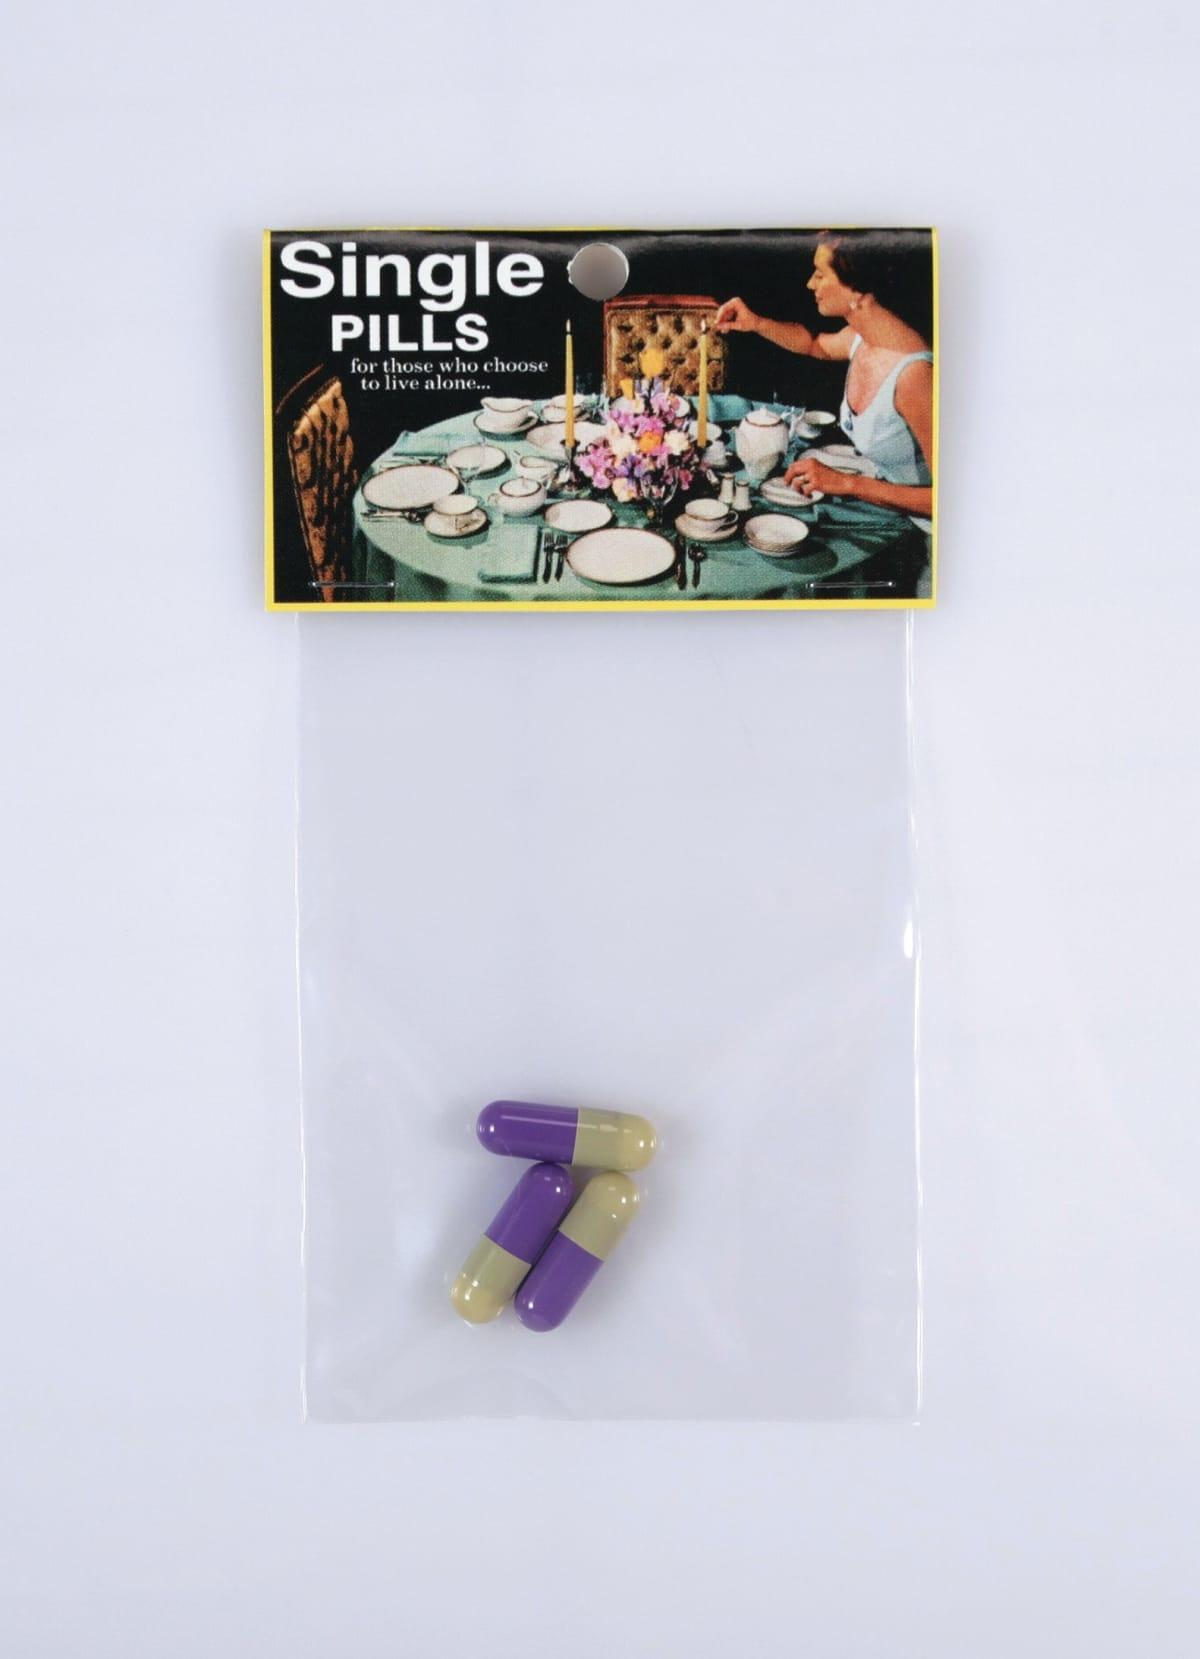 Single pills